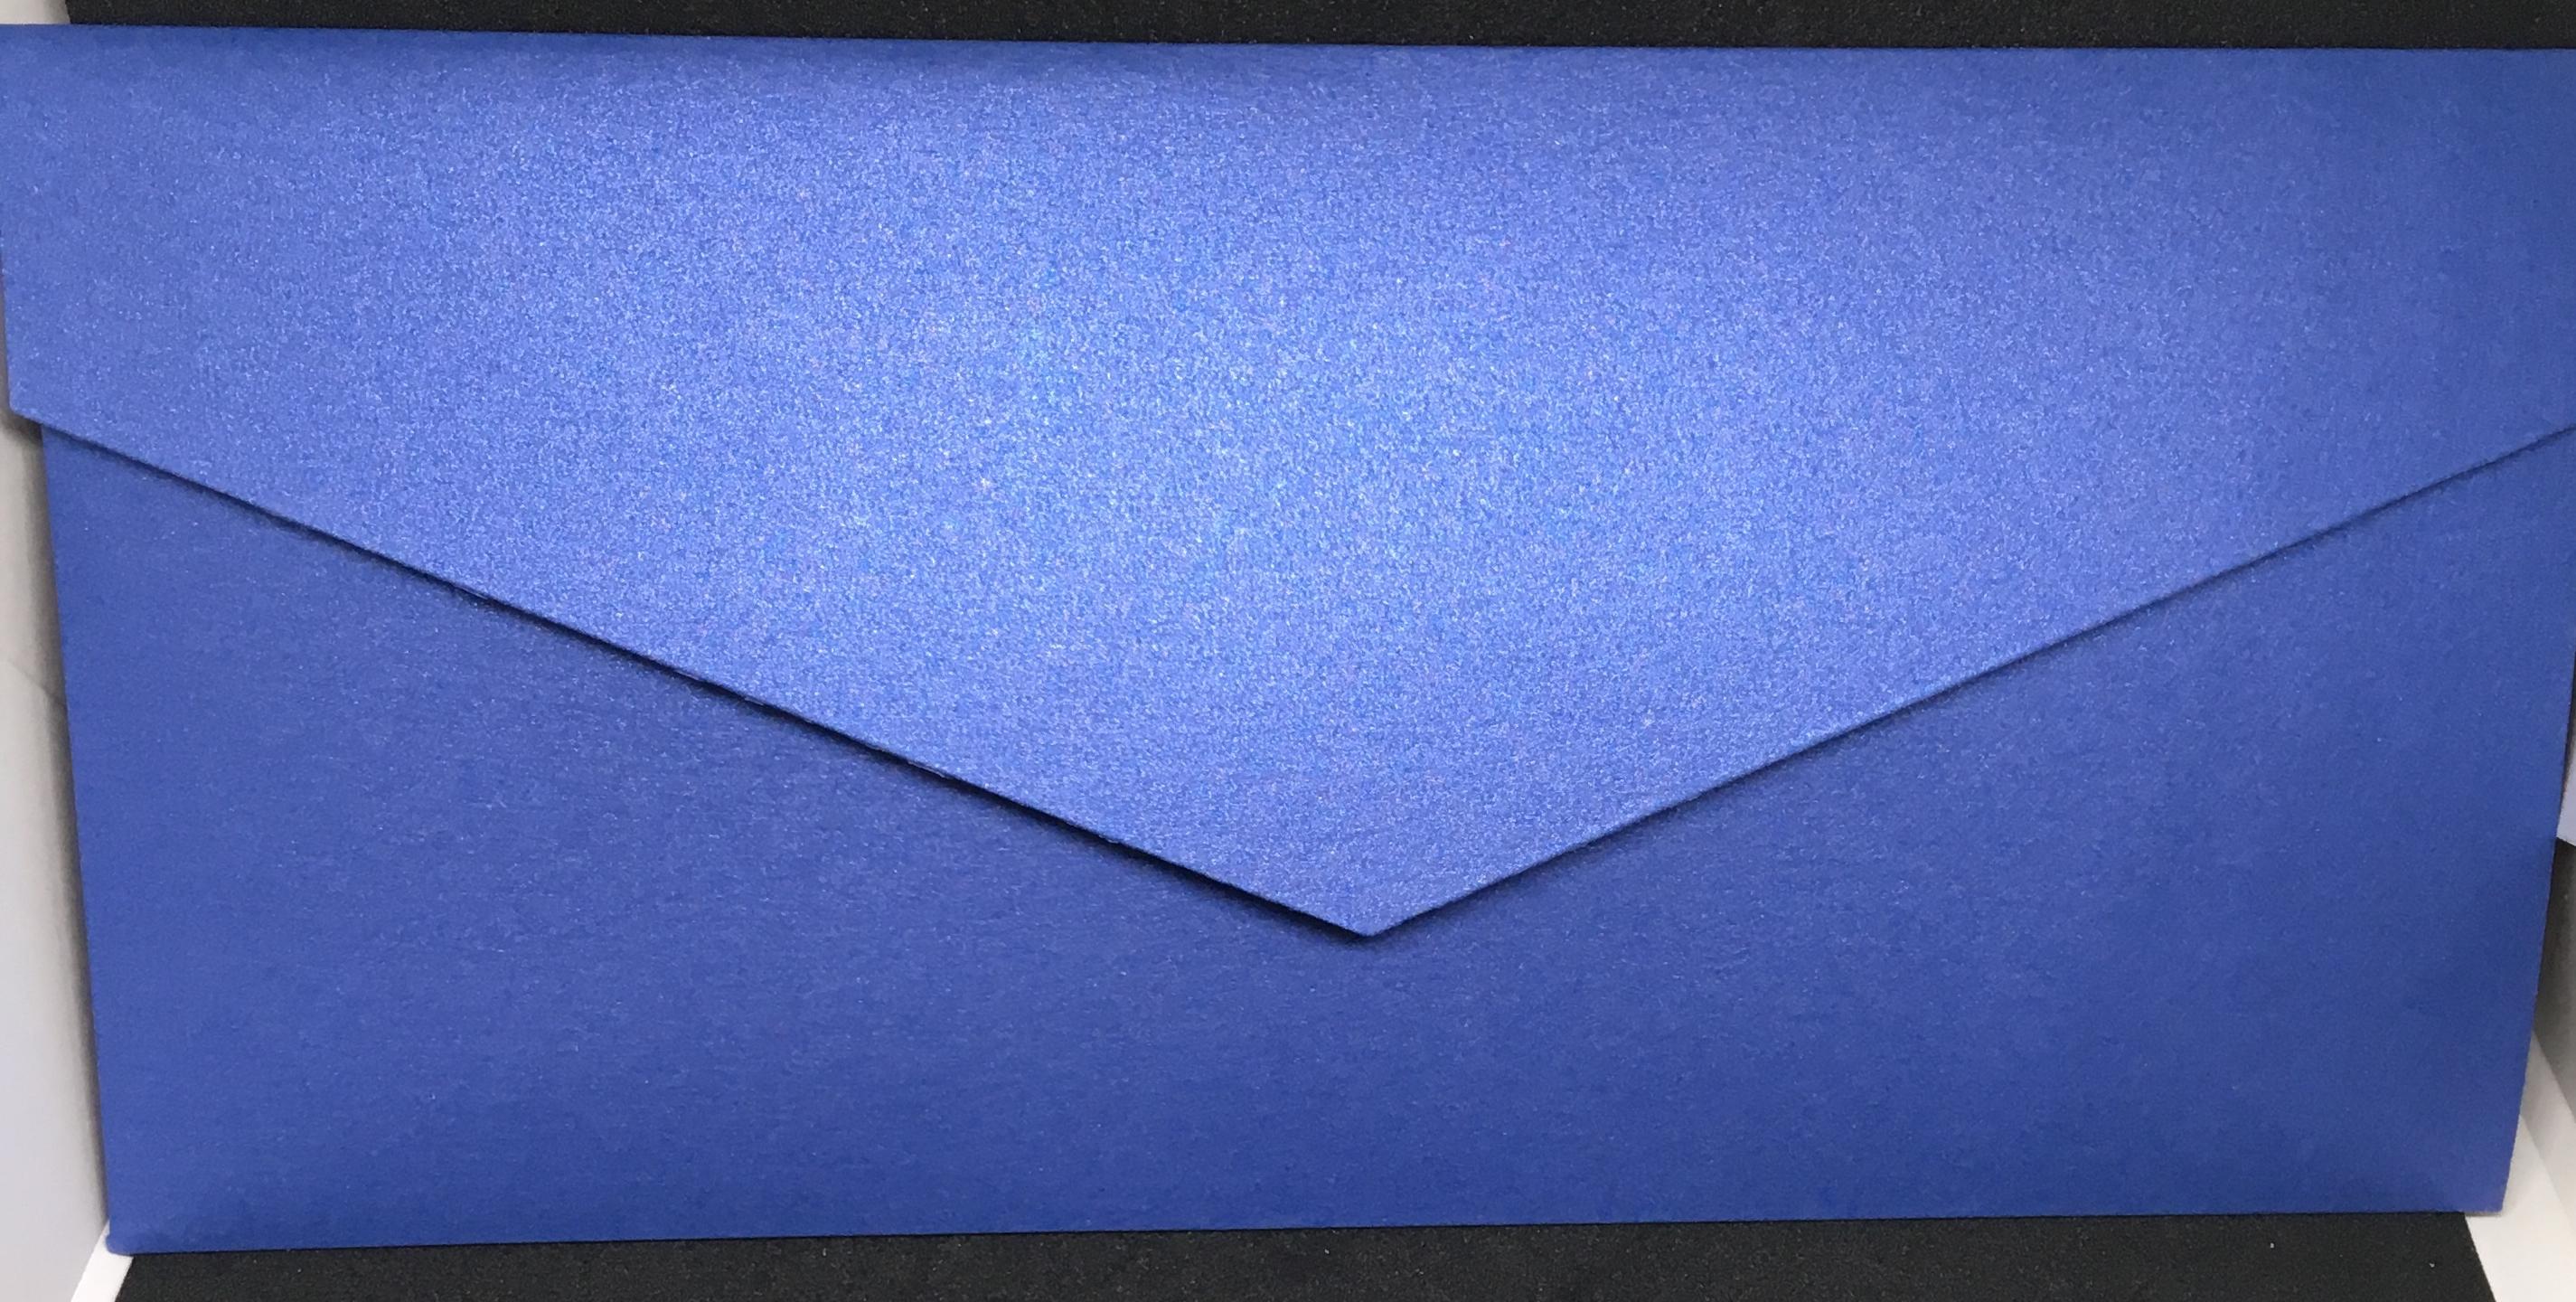 Autograph pocket fold - £2.50